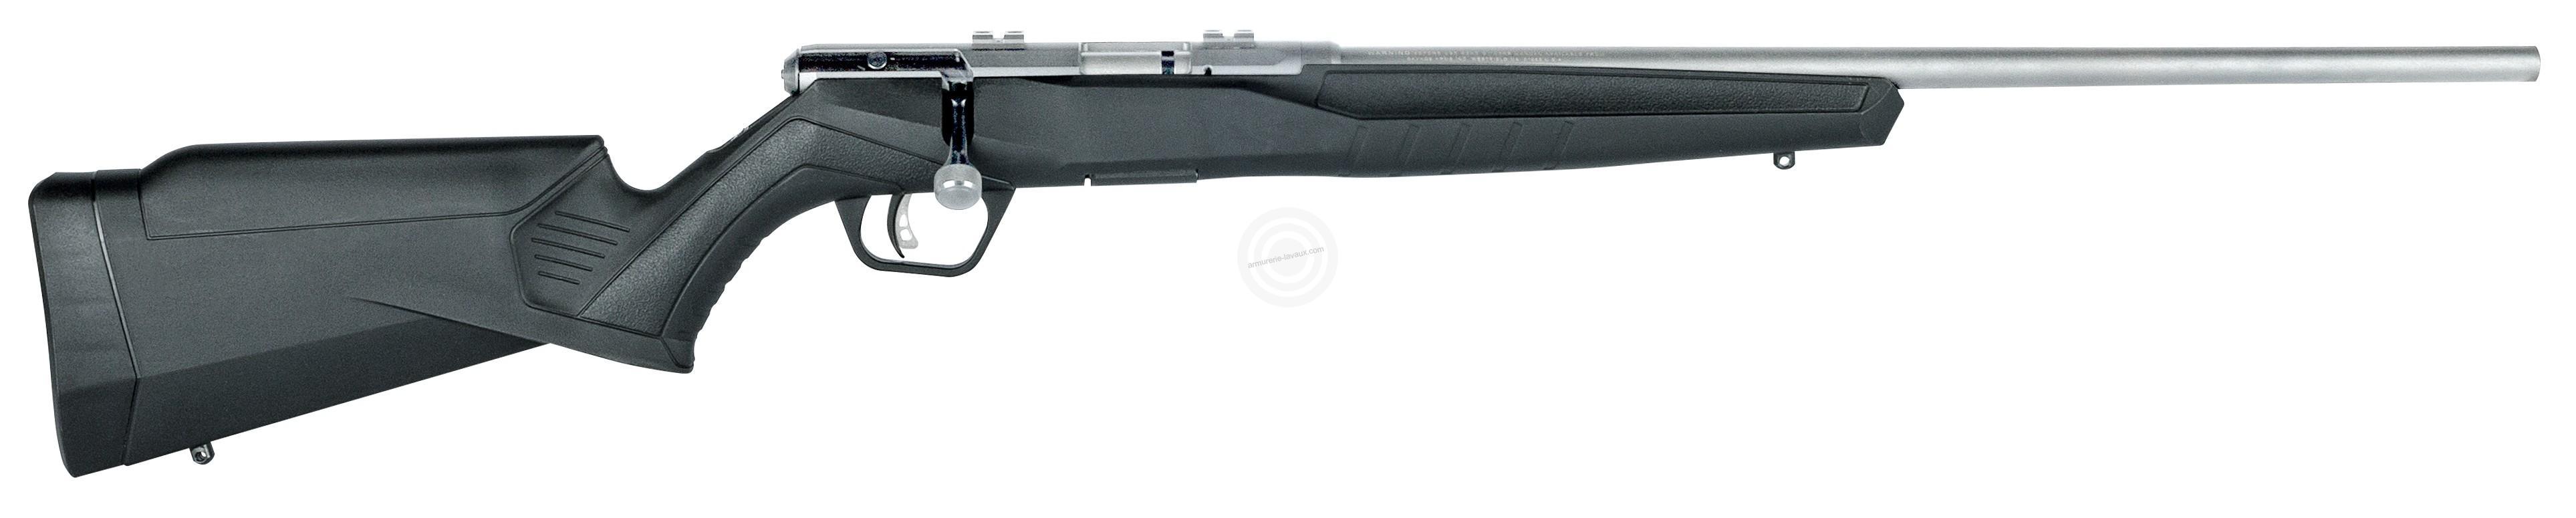 Carabine 22LR SAVAGE Series B22FVSS